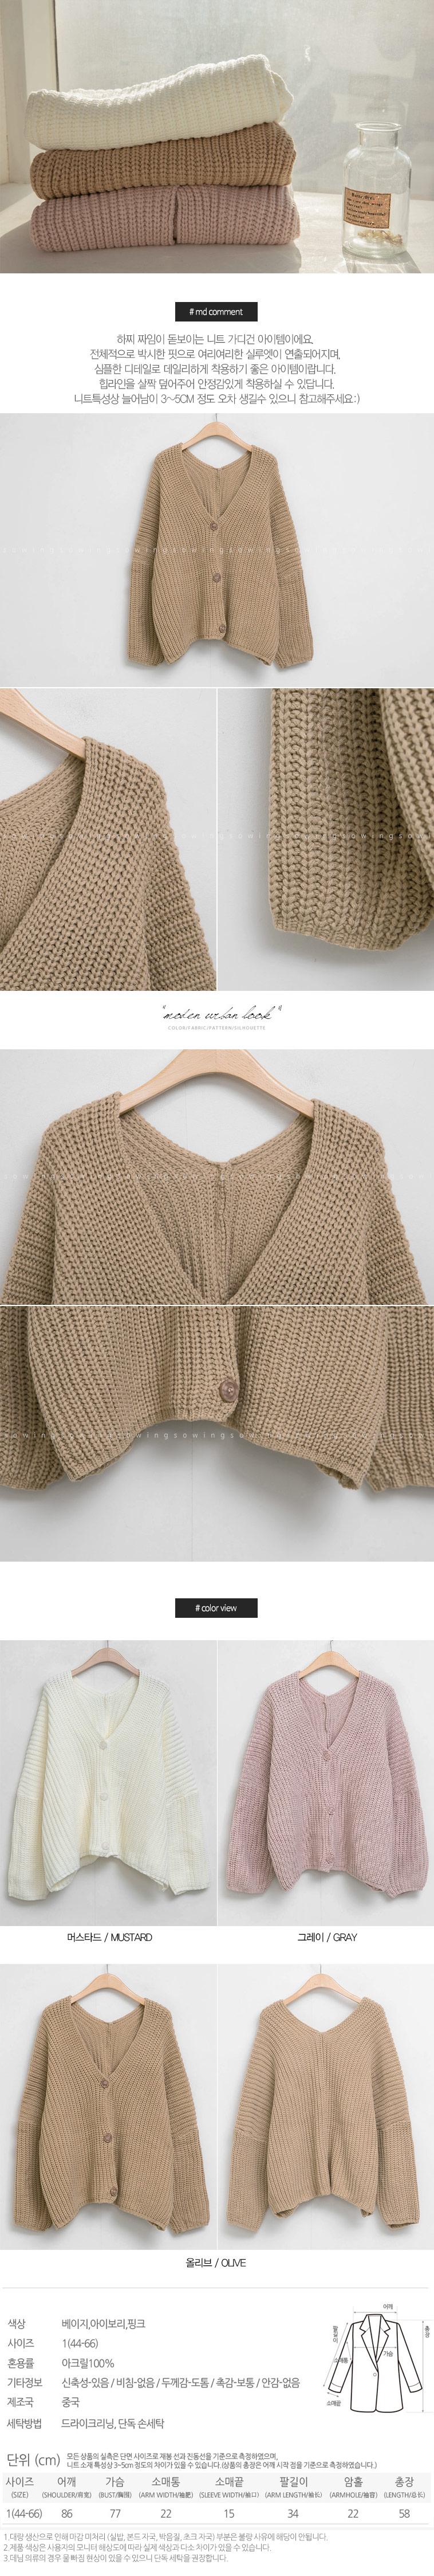 Pullover cardigan